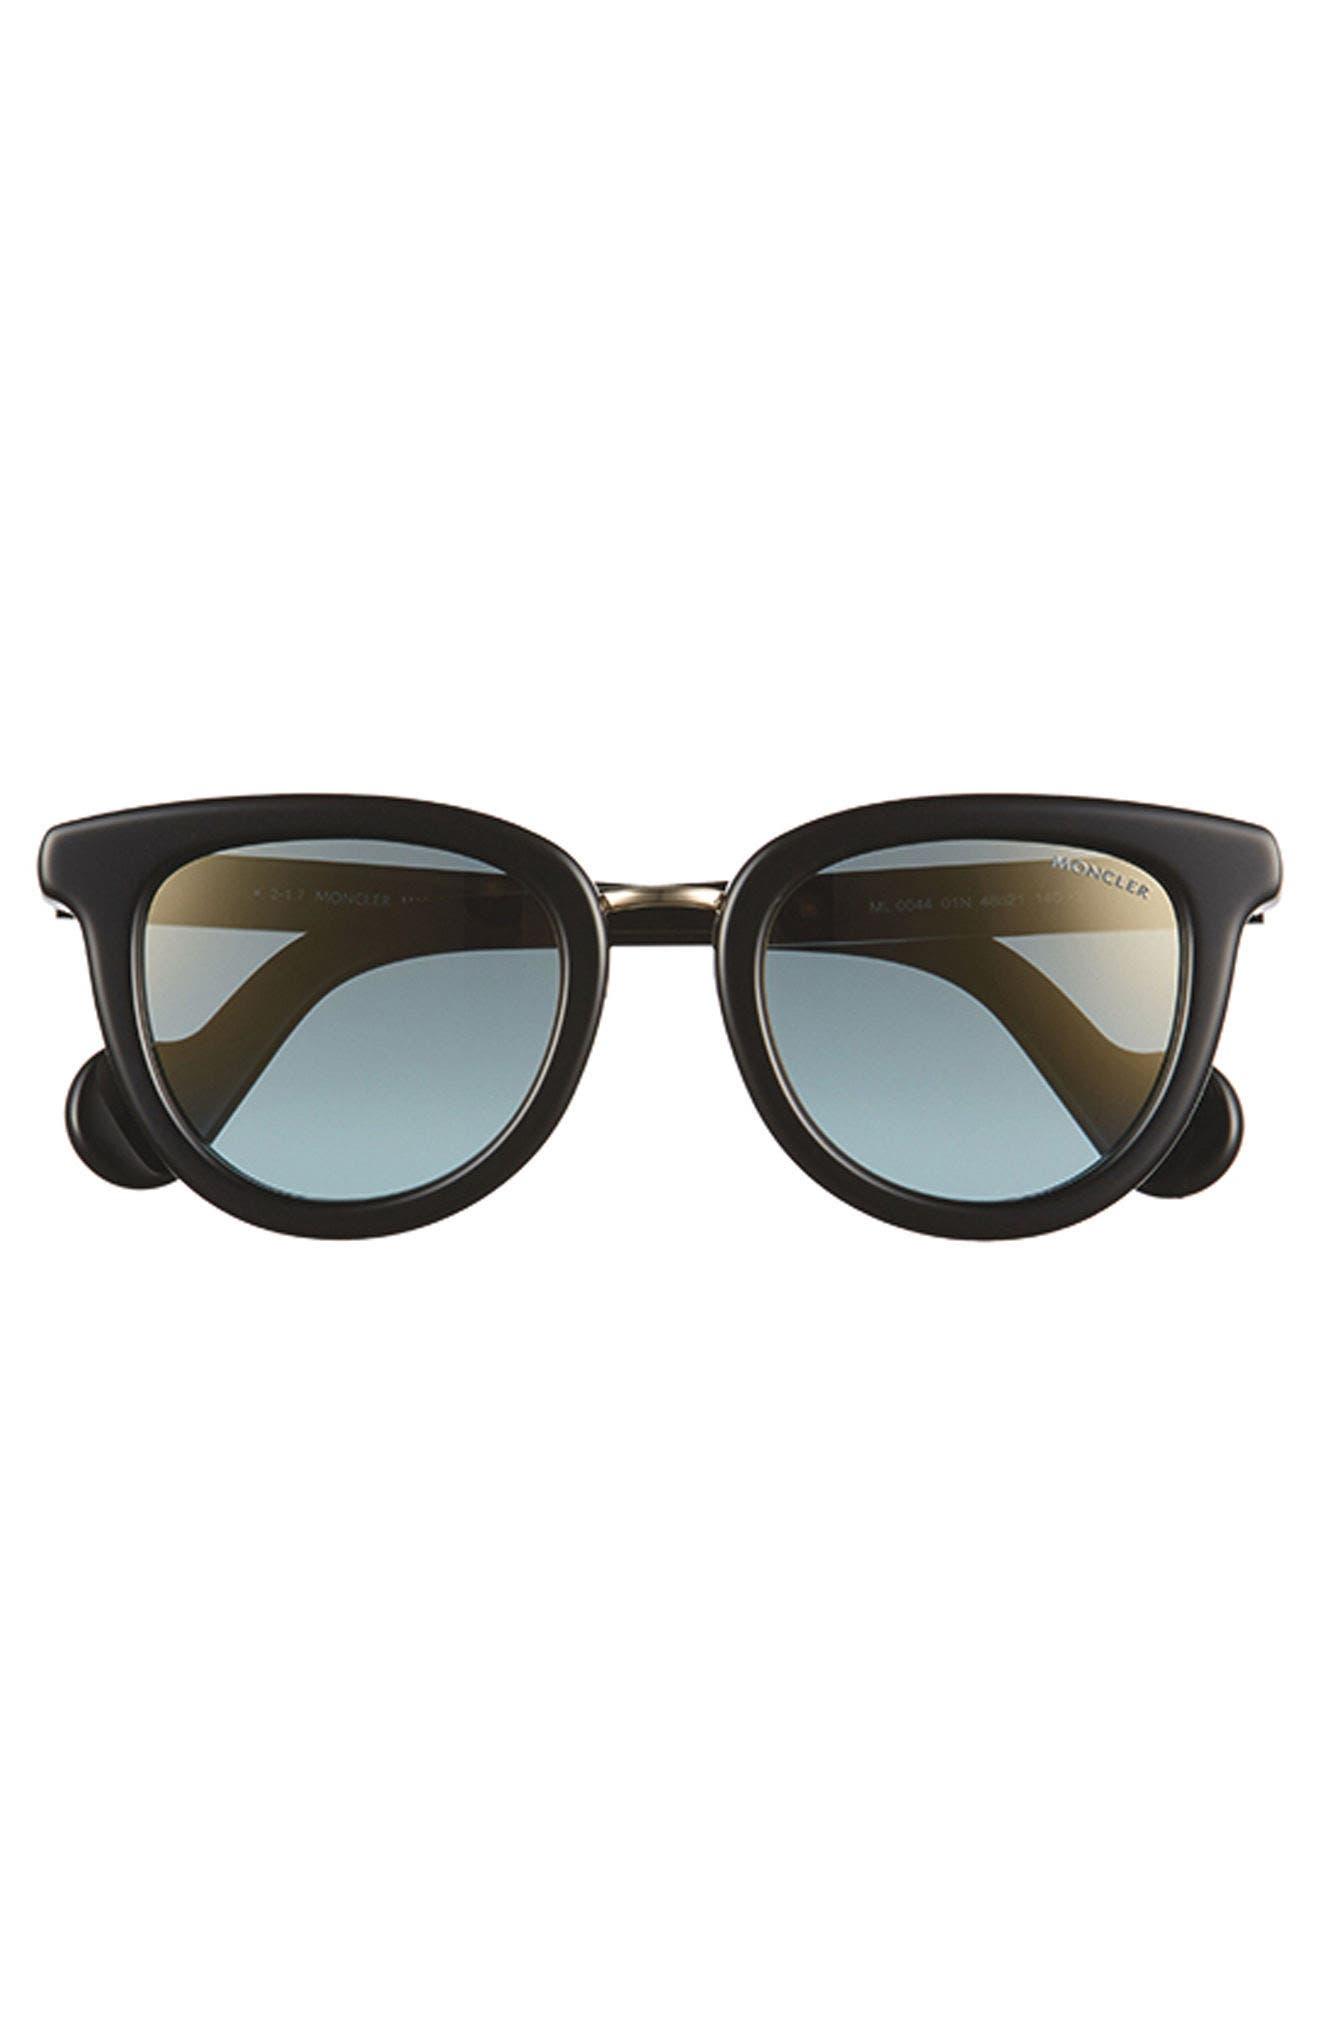 48mm Cat Eye Sunglasses,                             Alternate thumbnail 4, color,                             BLACK/ PALE GOLD/ LIGHT BLUE